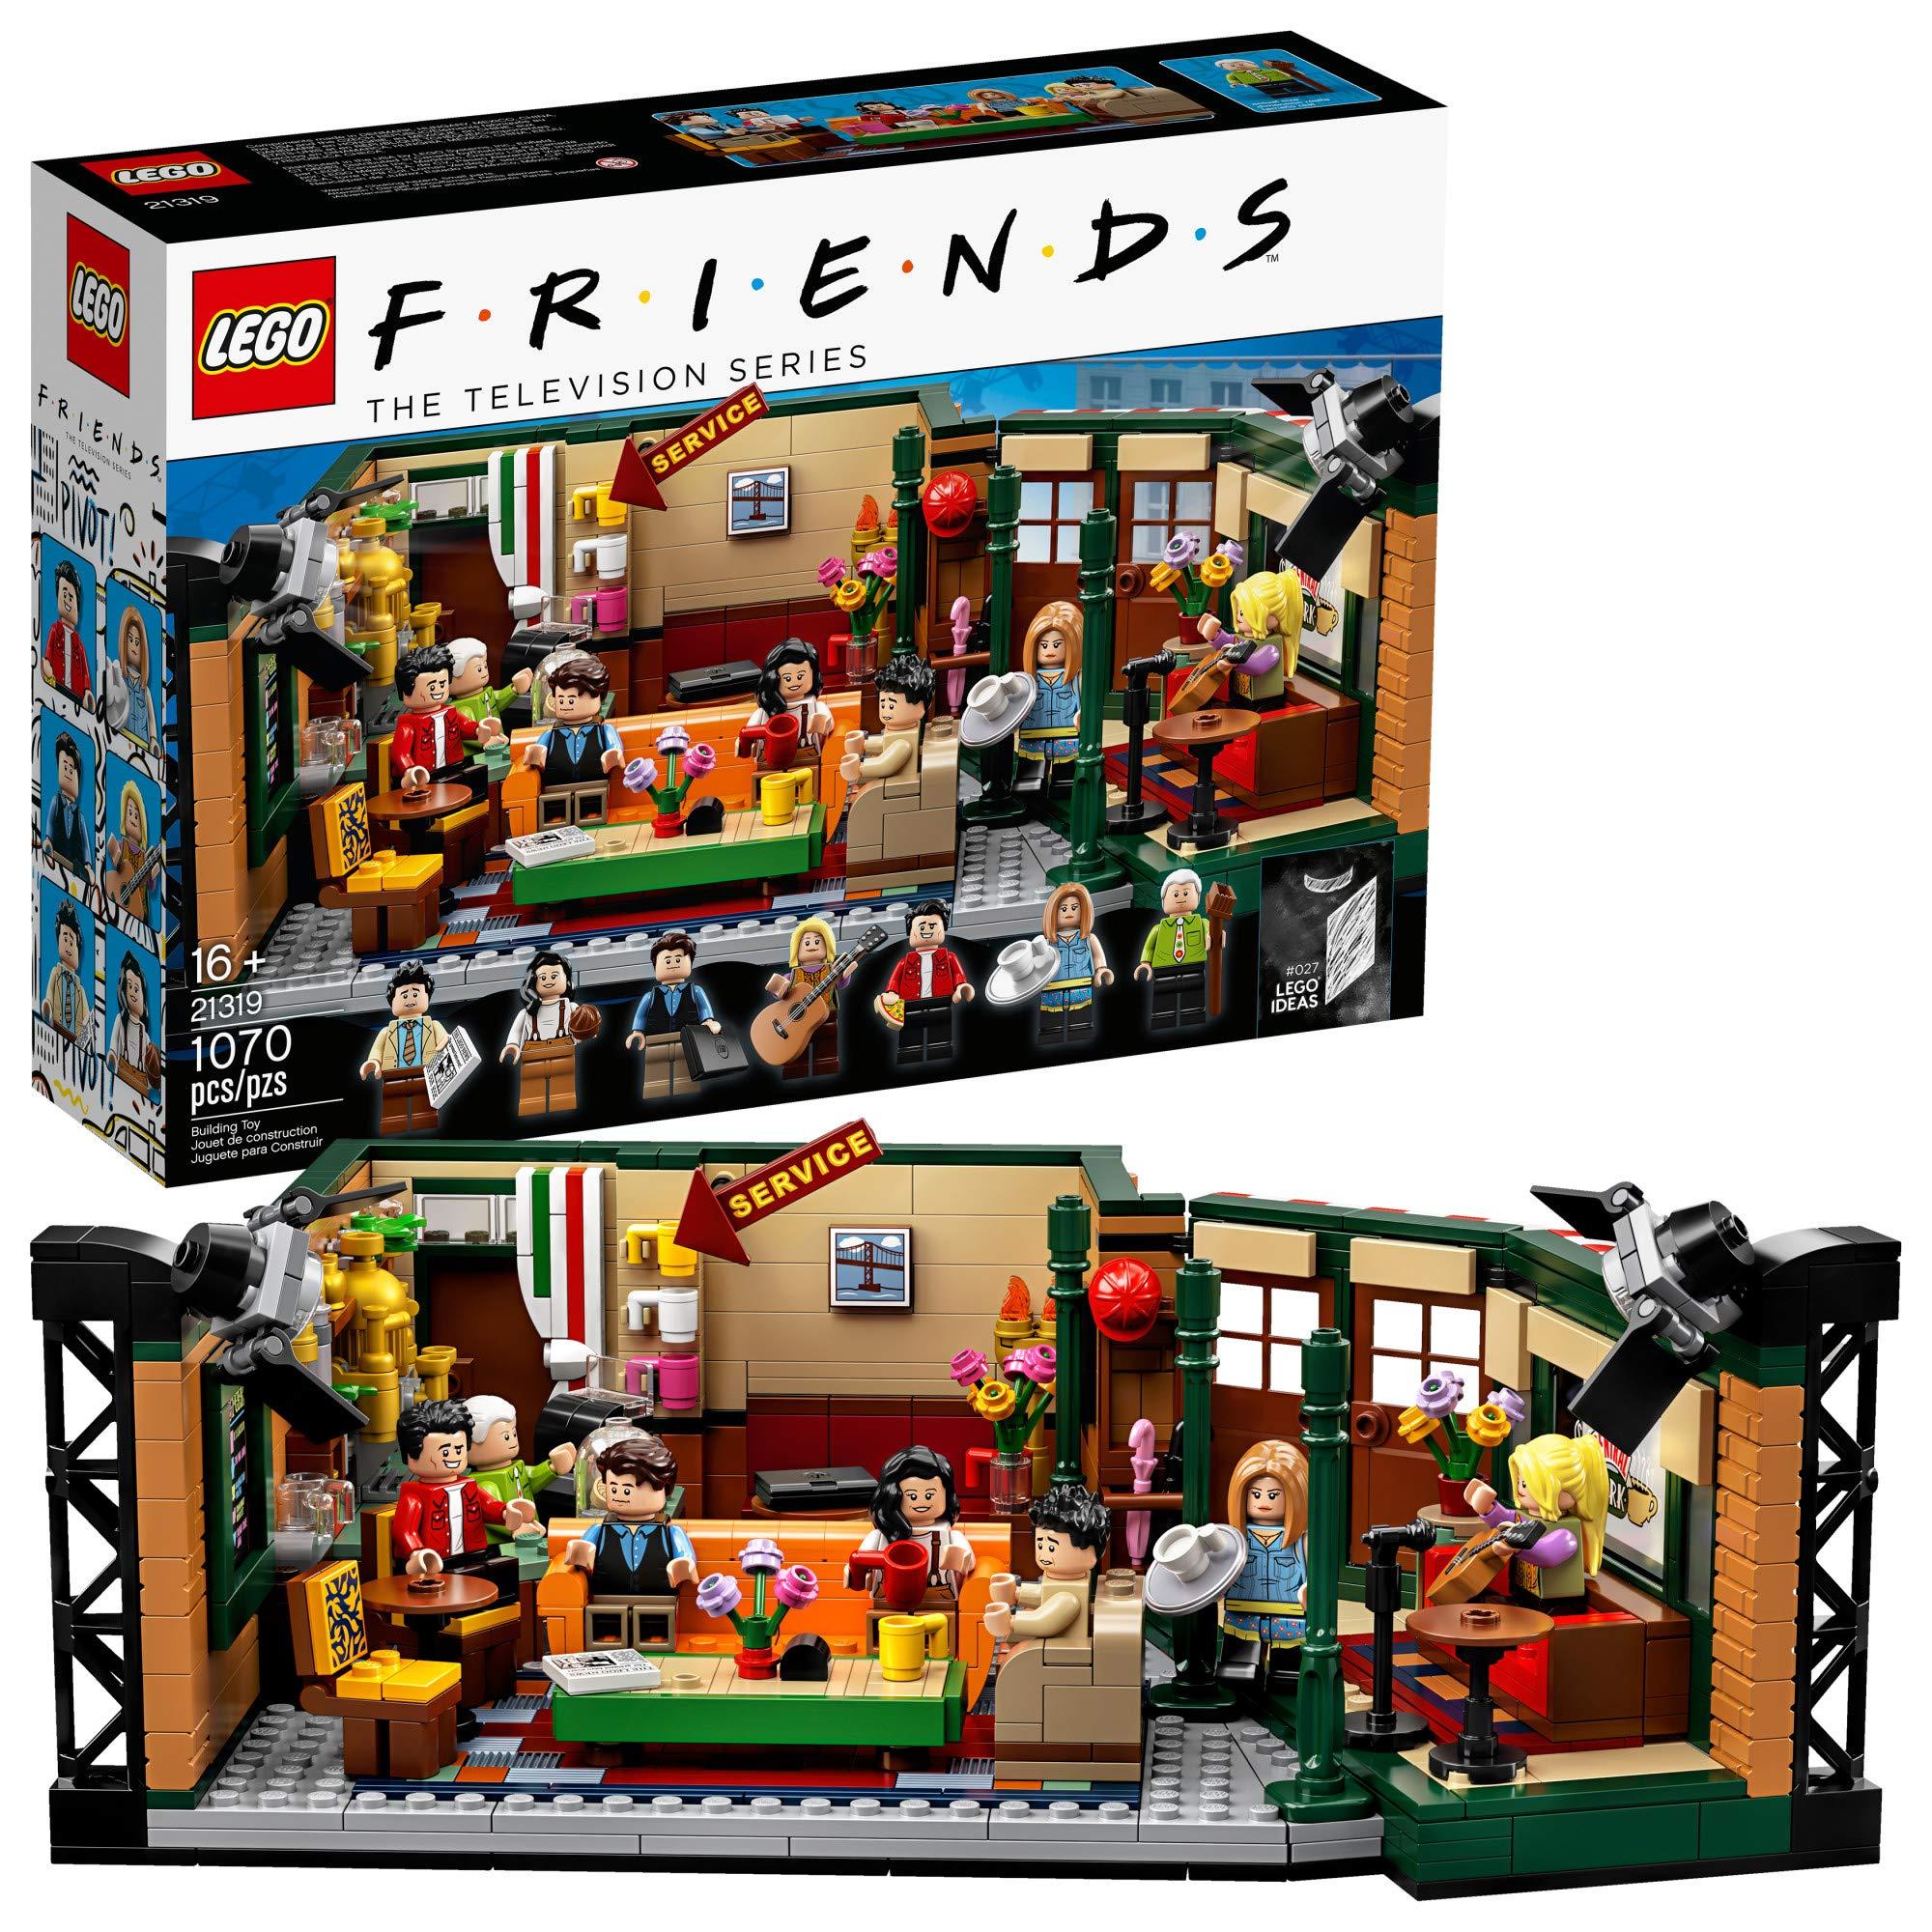 LEGO Ideas 21319 Central Perk Building Kit (1,070 Pieces) for $48.99 @ Amazon